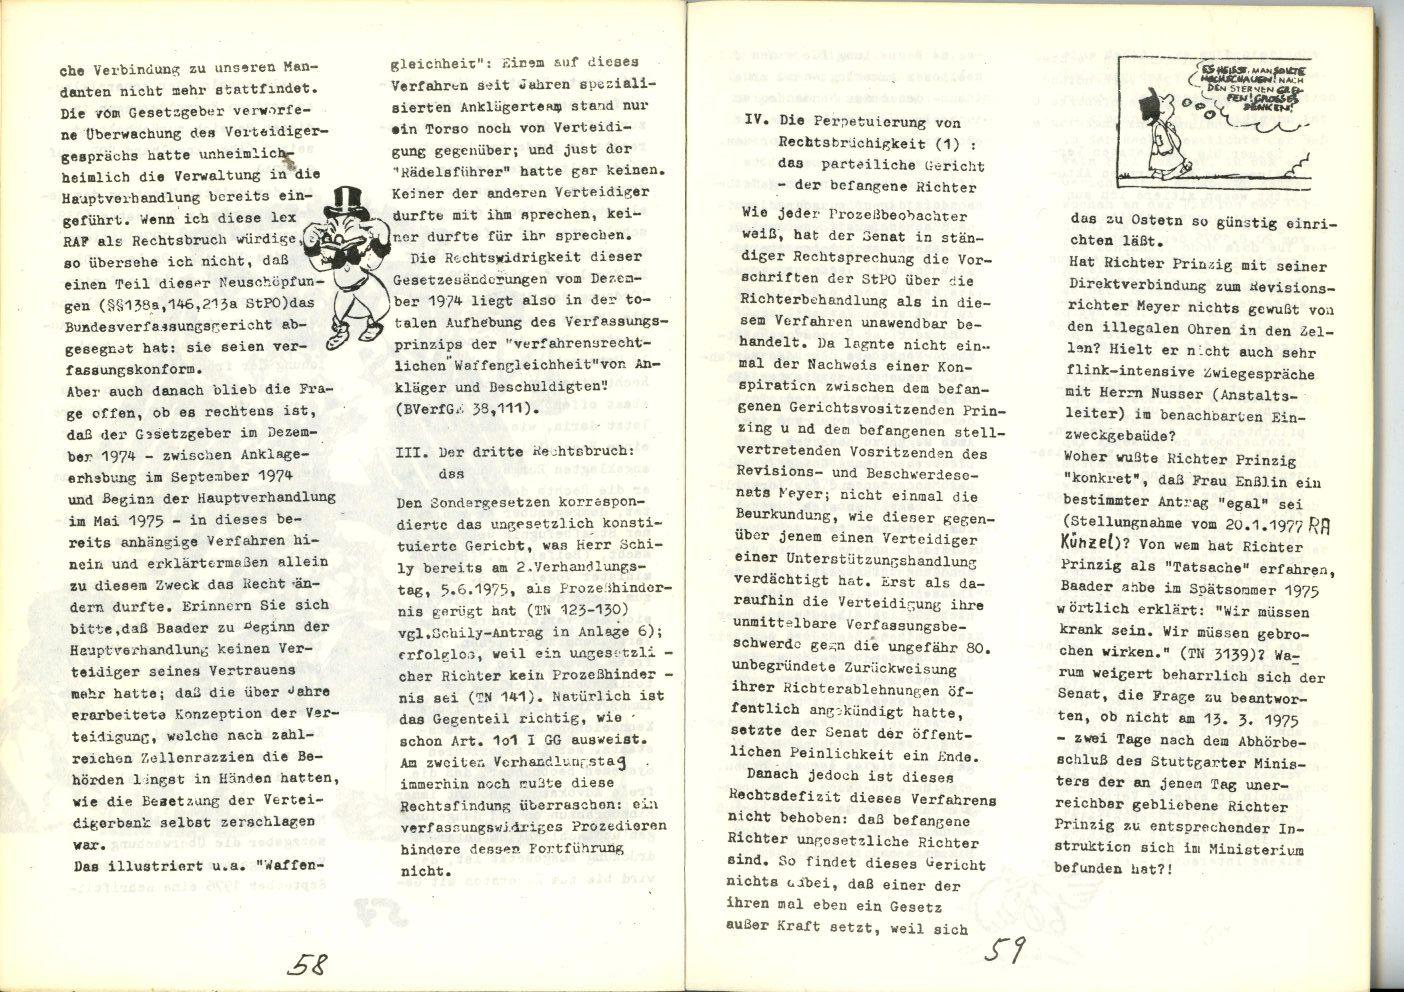 Marburg_Russell_Initiative_1978_31